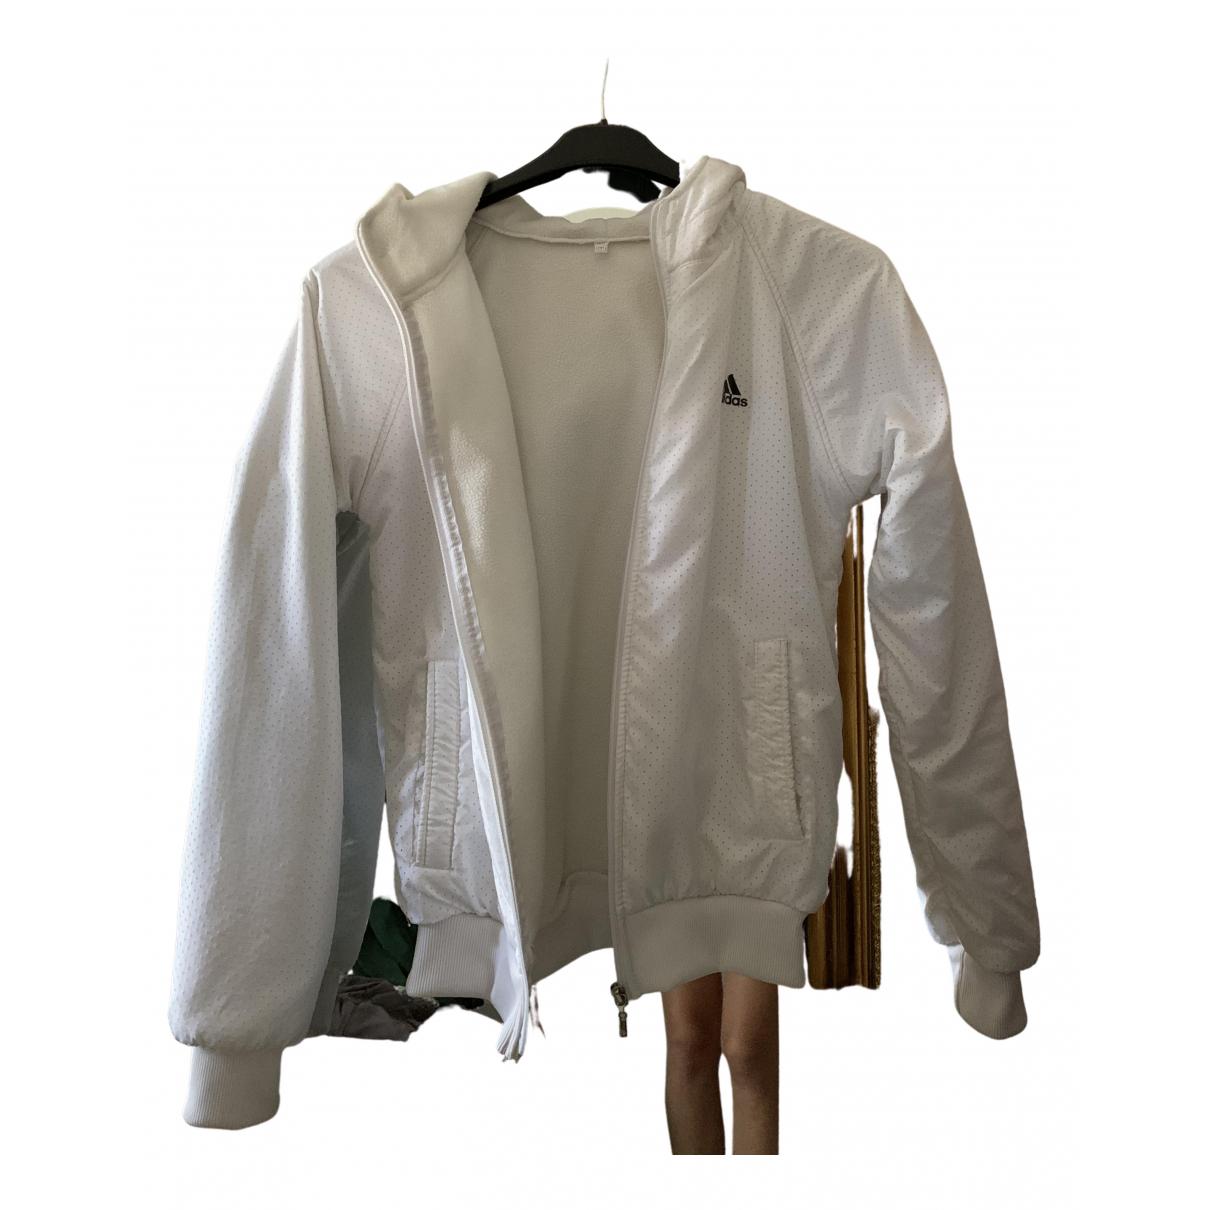 Adidas \N White jacket for Women S International